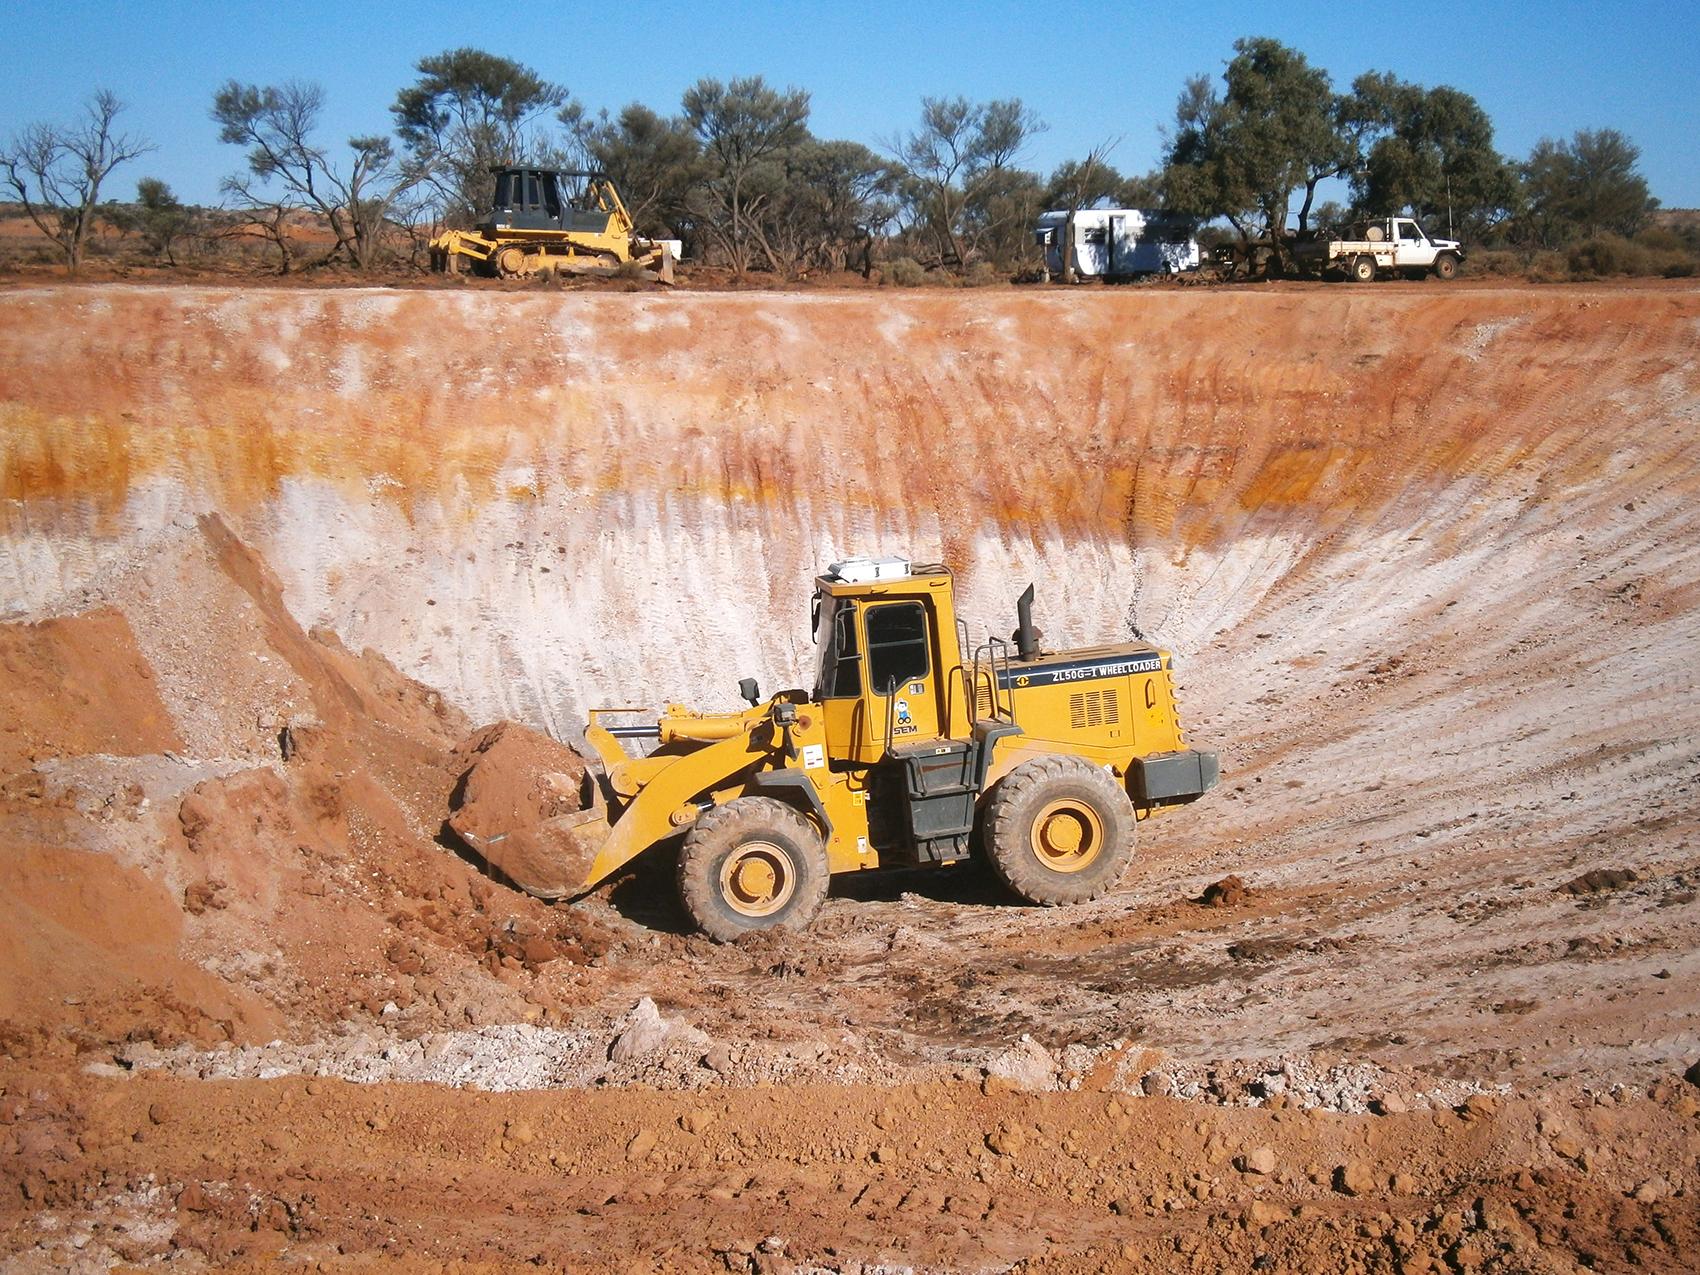 williams-cattle-company-arckaringa-station-south-australia-cattle-station-sa-plant-and-equipment-dam-sinking-at-arckaringa.jpg